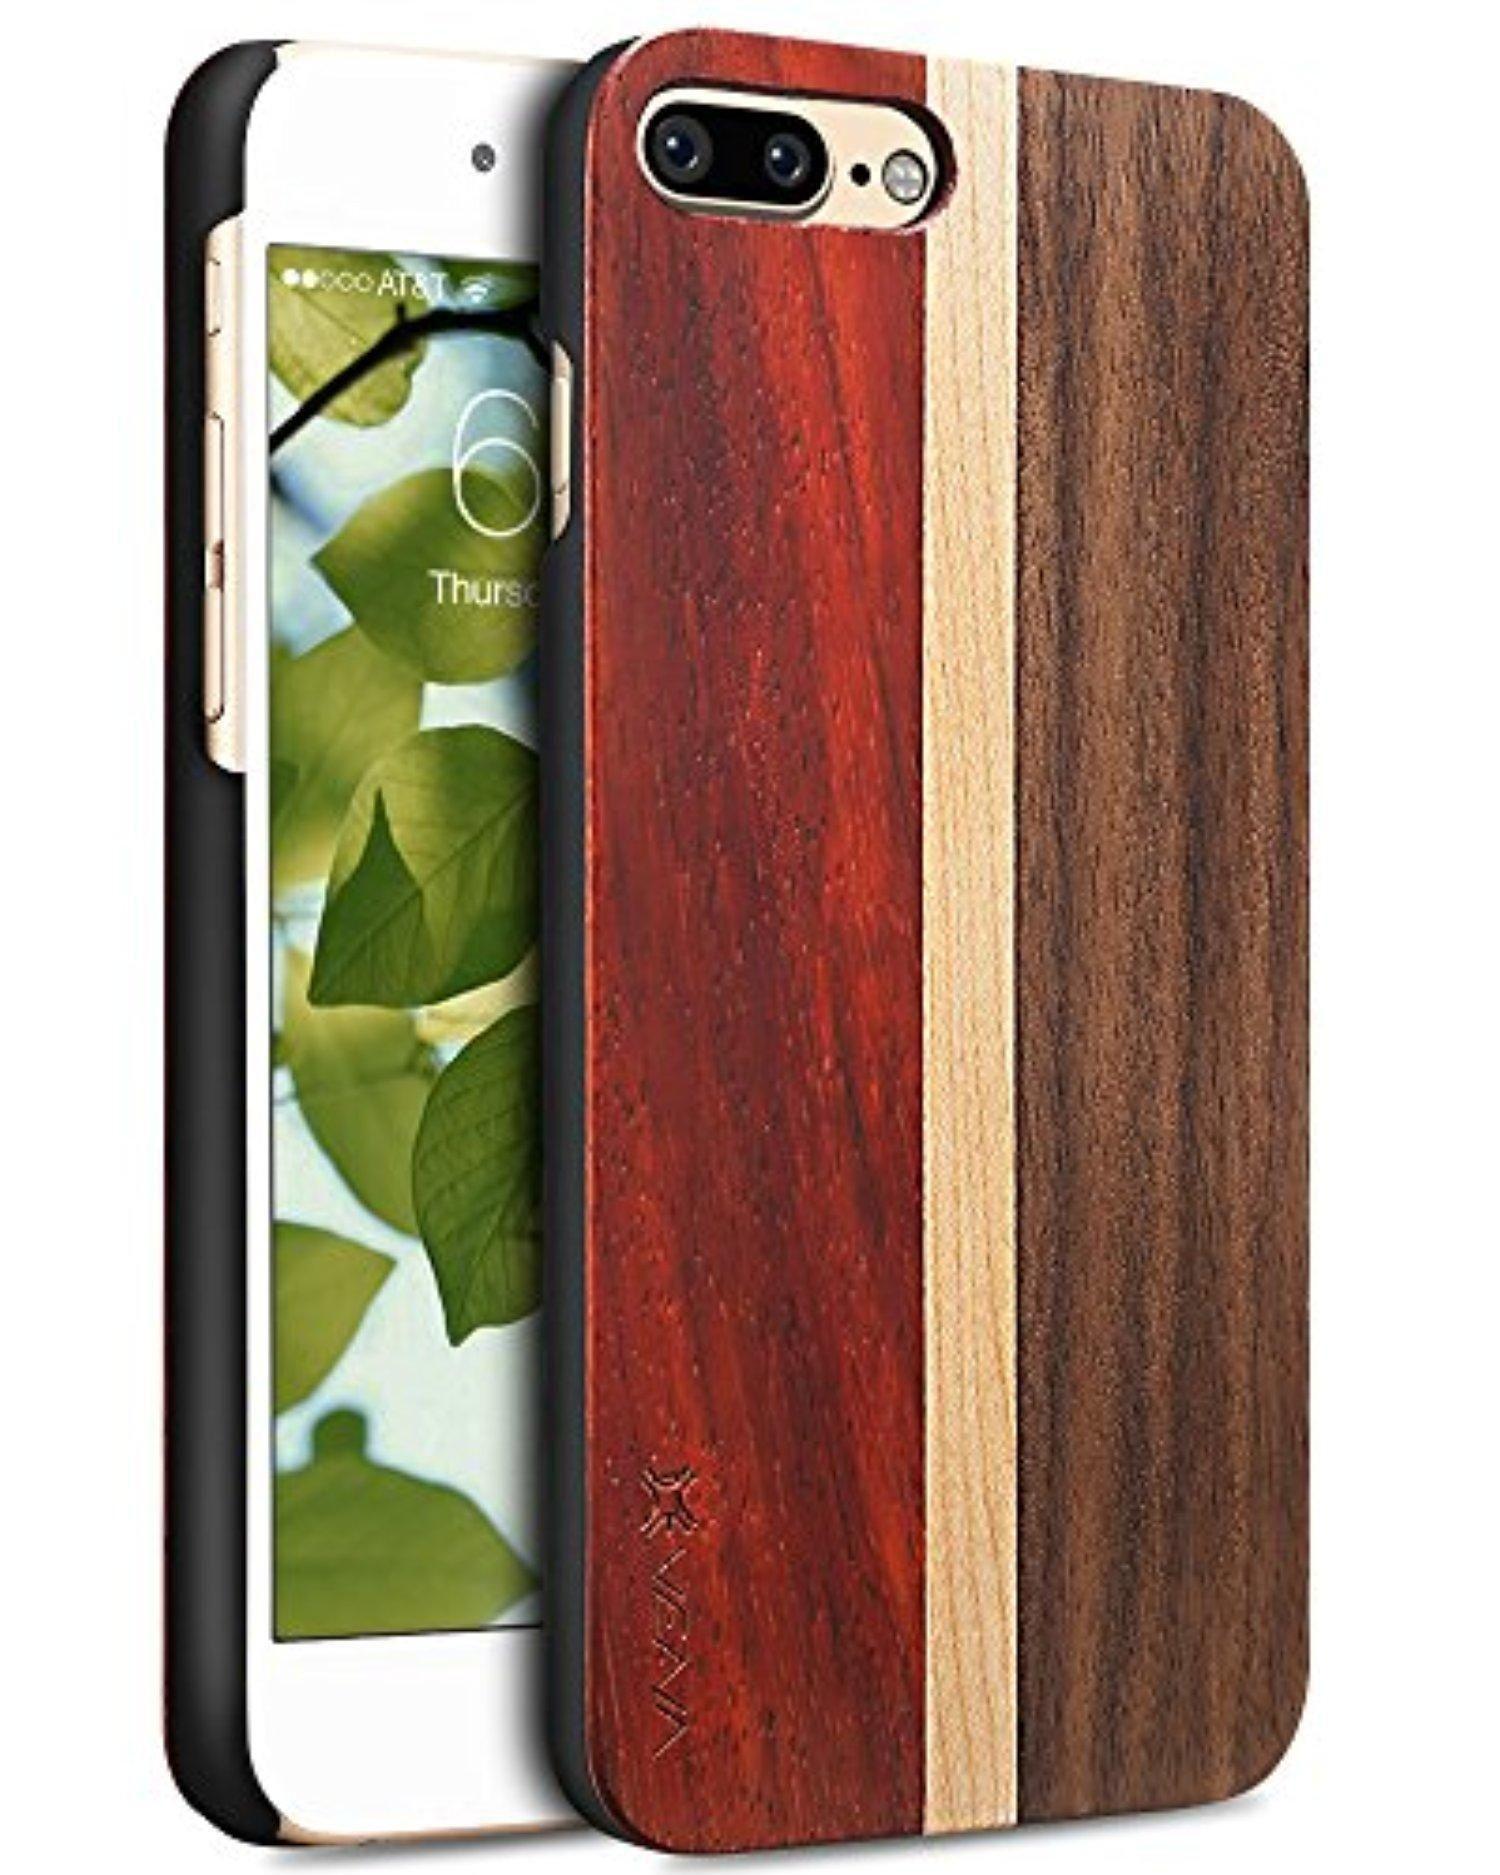 Iphone 7 Plus Case Vena Neu Unity Wooden Cover Slim Genuine Wood Backplate Hybrid Case For Apple Iphone 7 Plus Iphone 7 Plus Cases Iphone 7 Plus Best Iphone